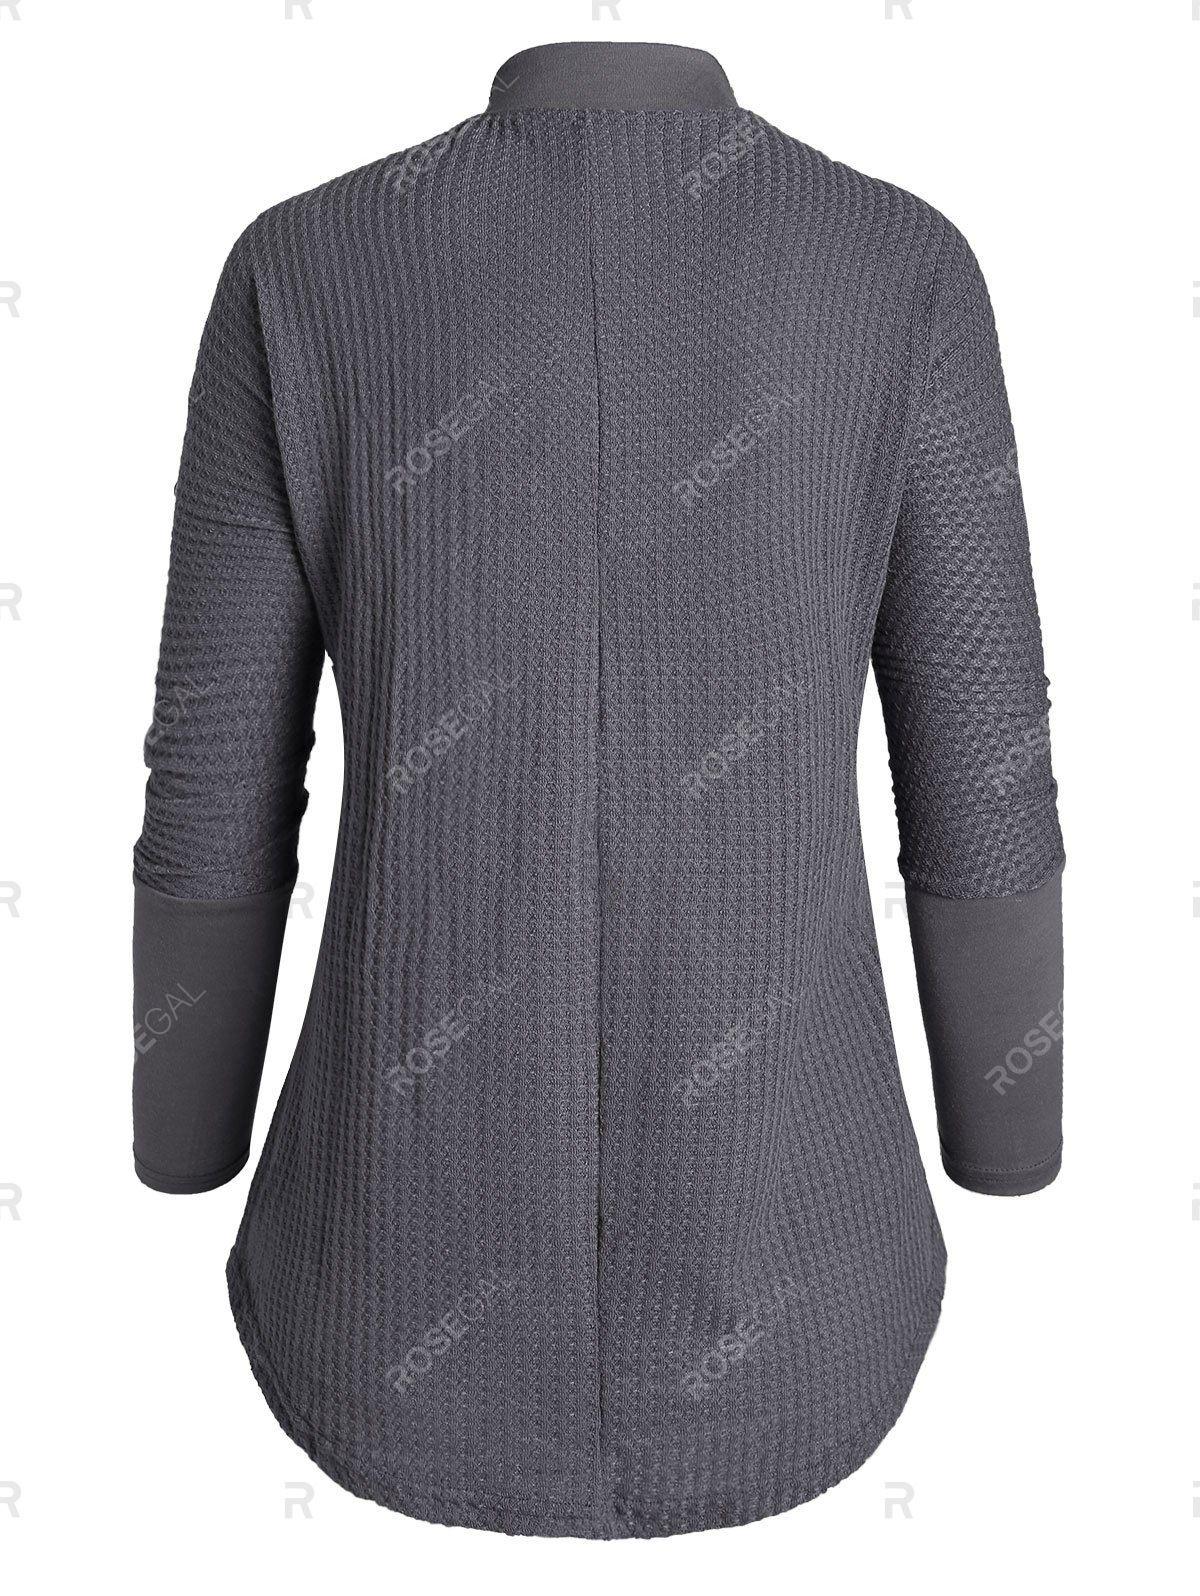 Plus Size Half Button Irregular Knitwear 7